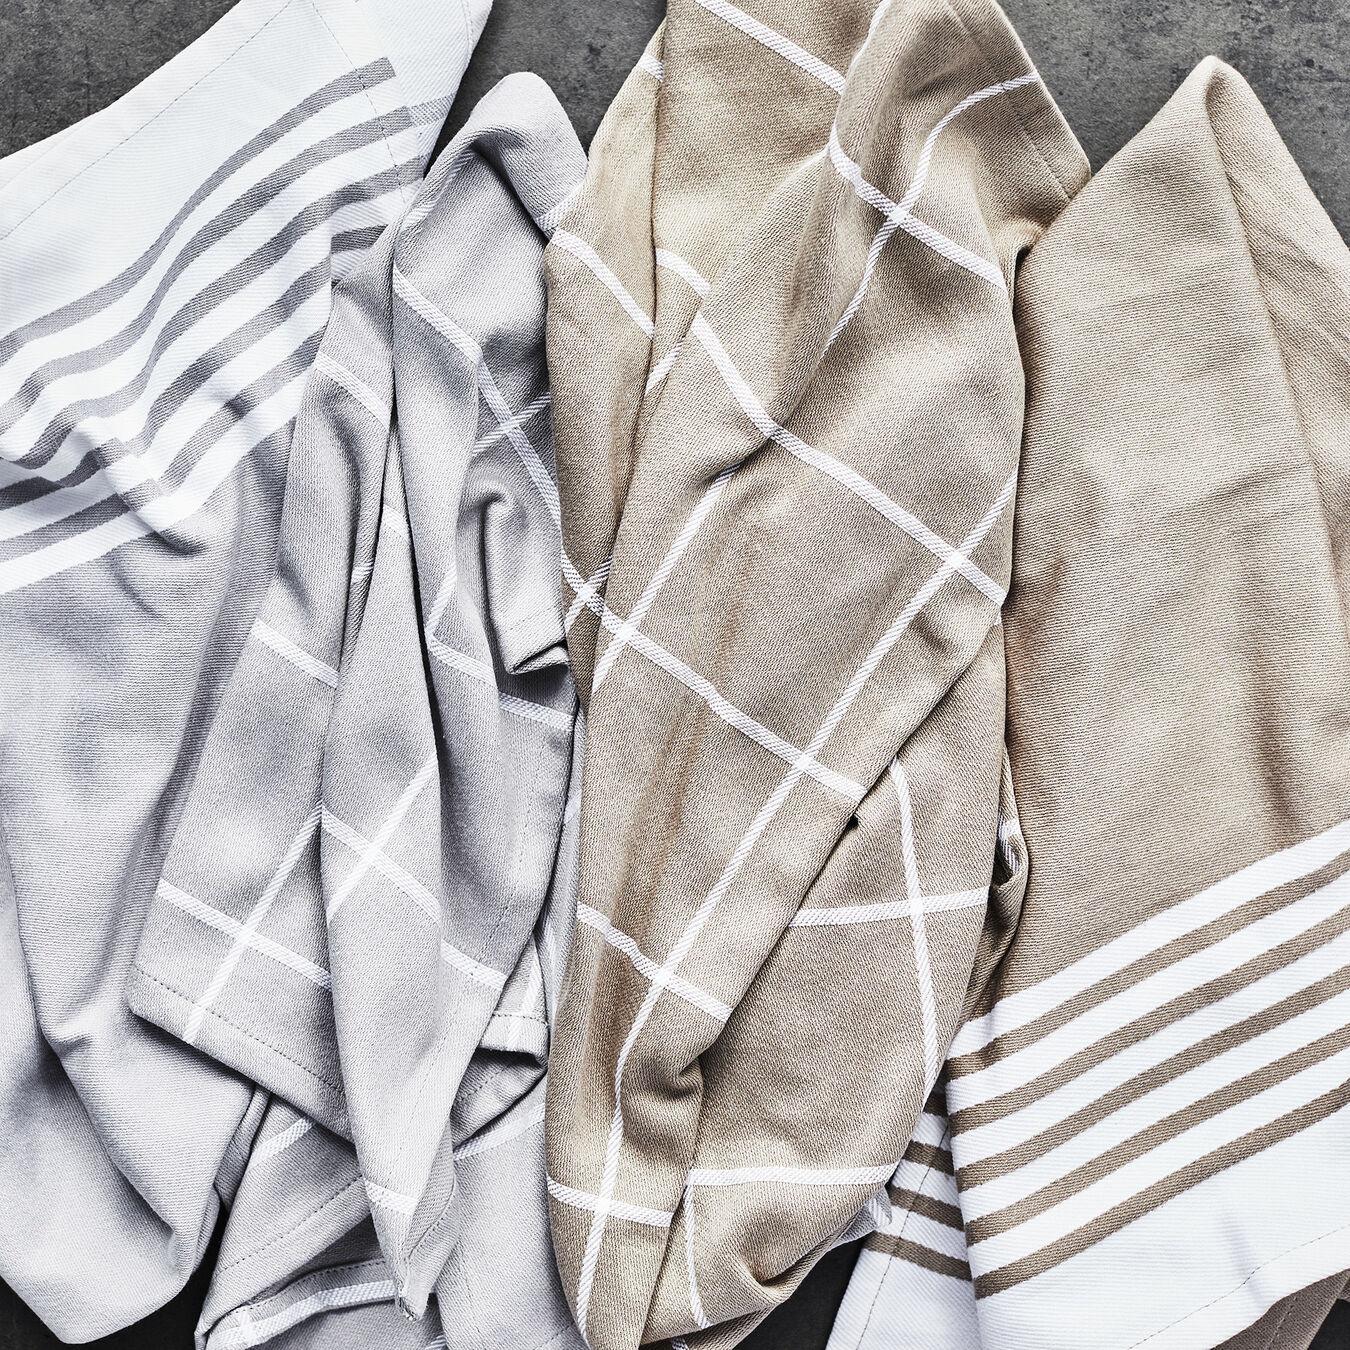 4-pc Kitchen Towel Set - Grey,,large 6